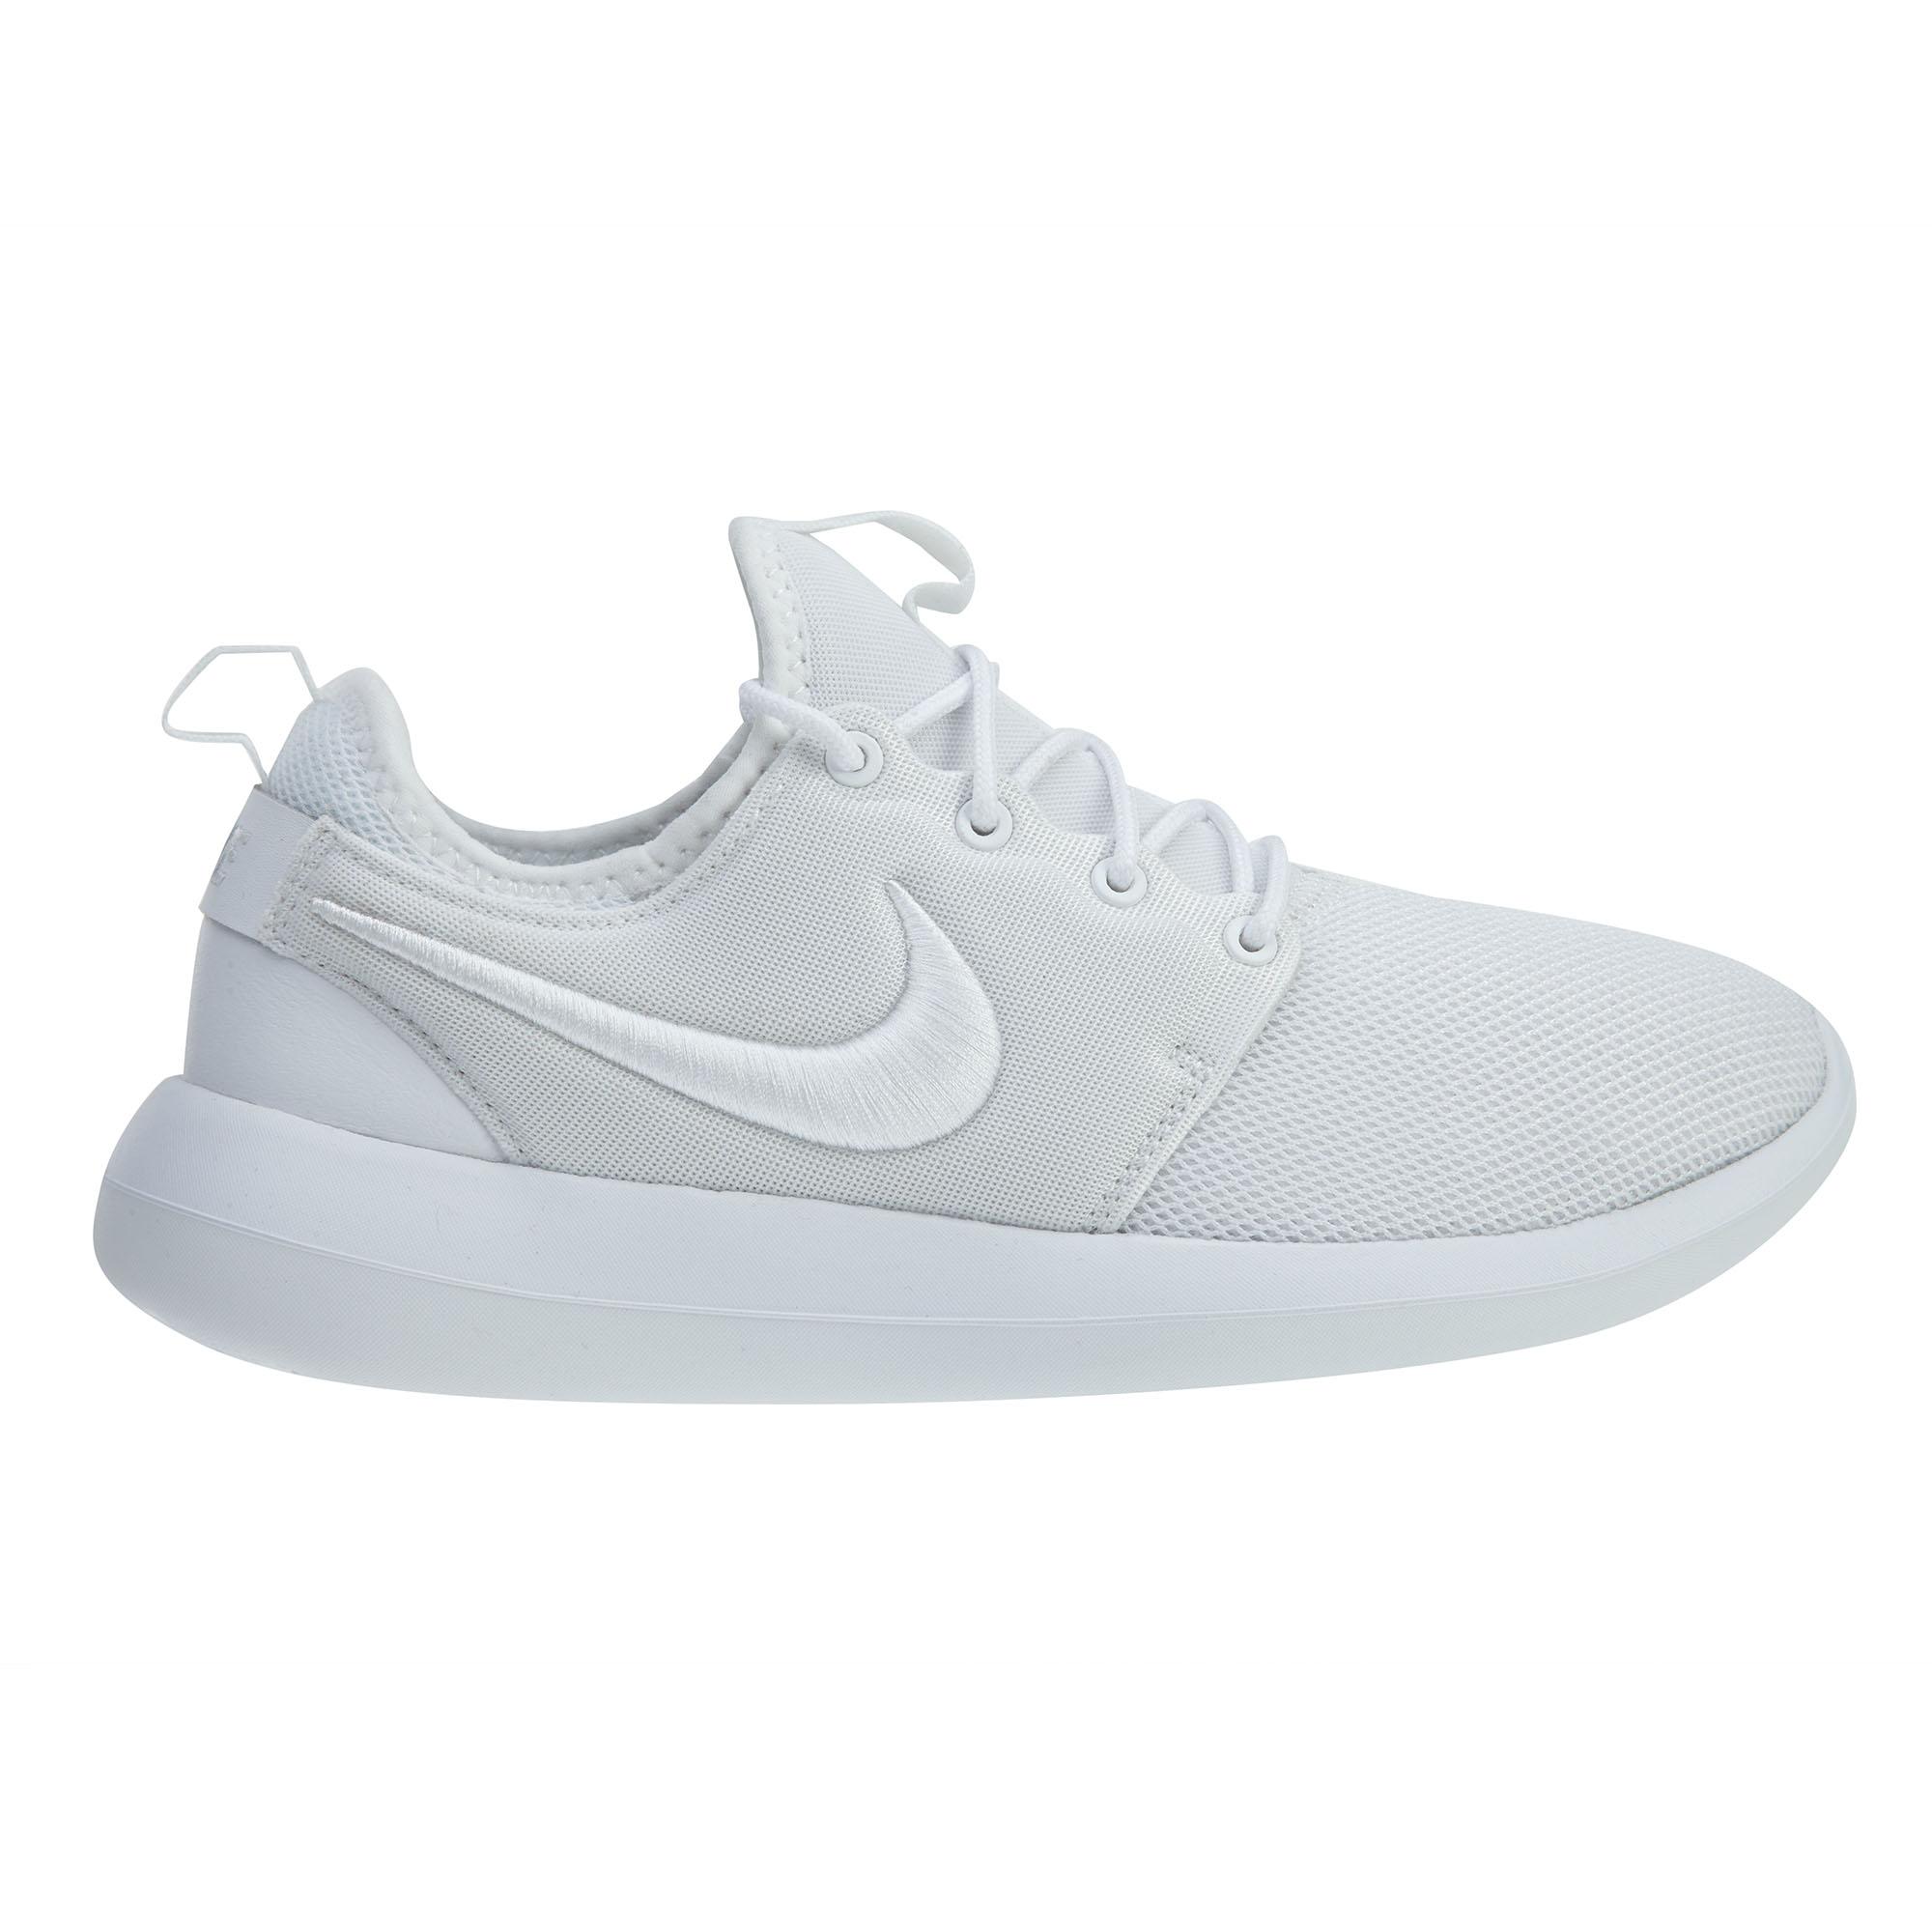 Nike Roshe Two Br White White-Glacier